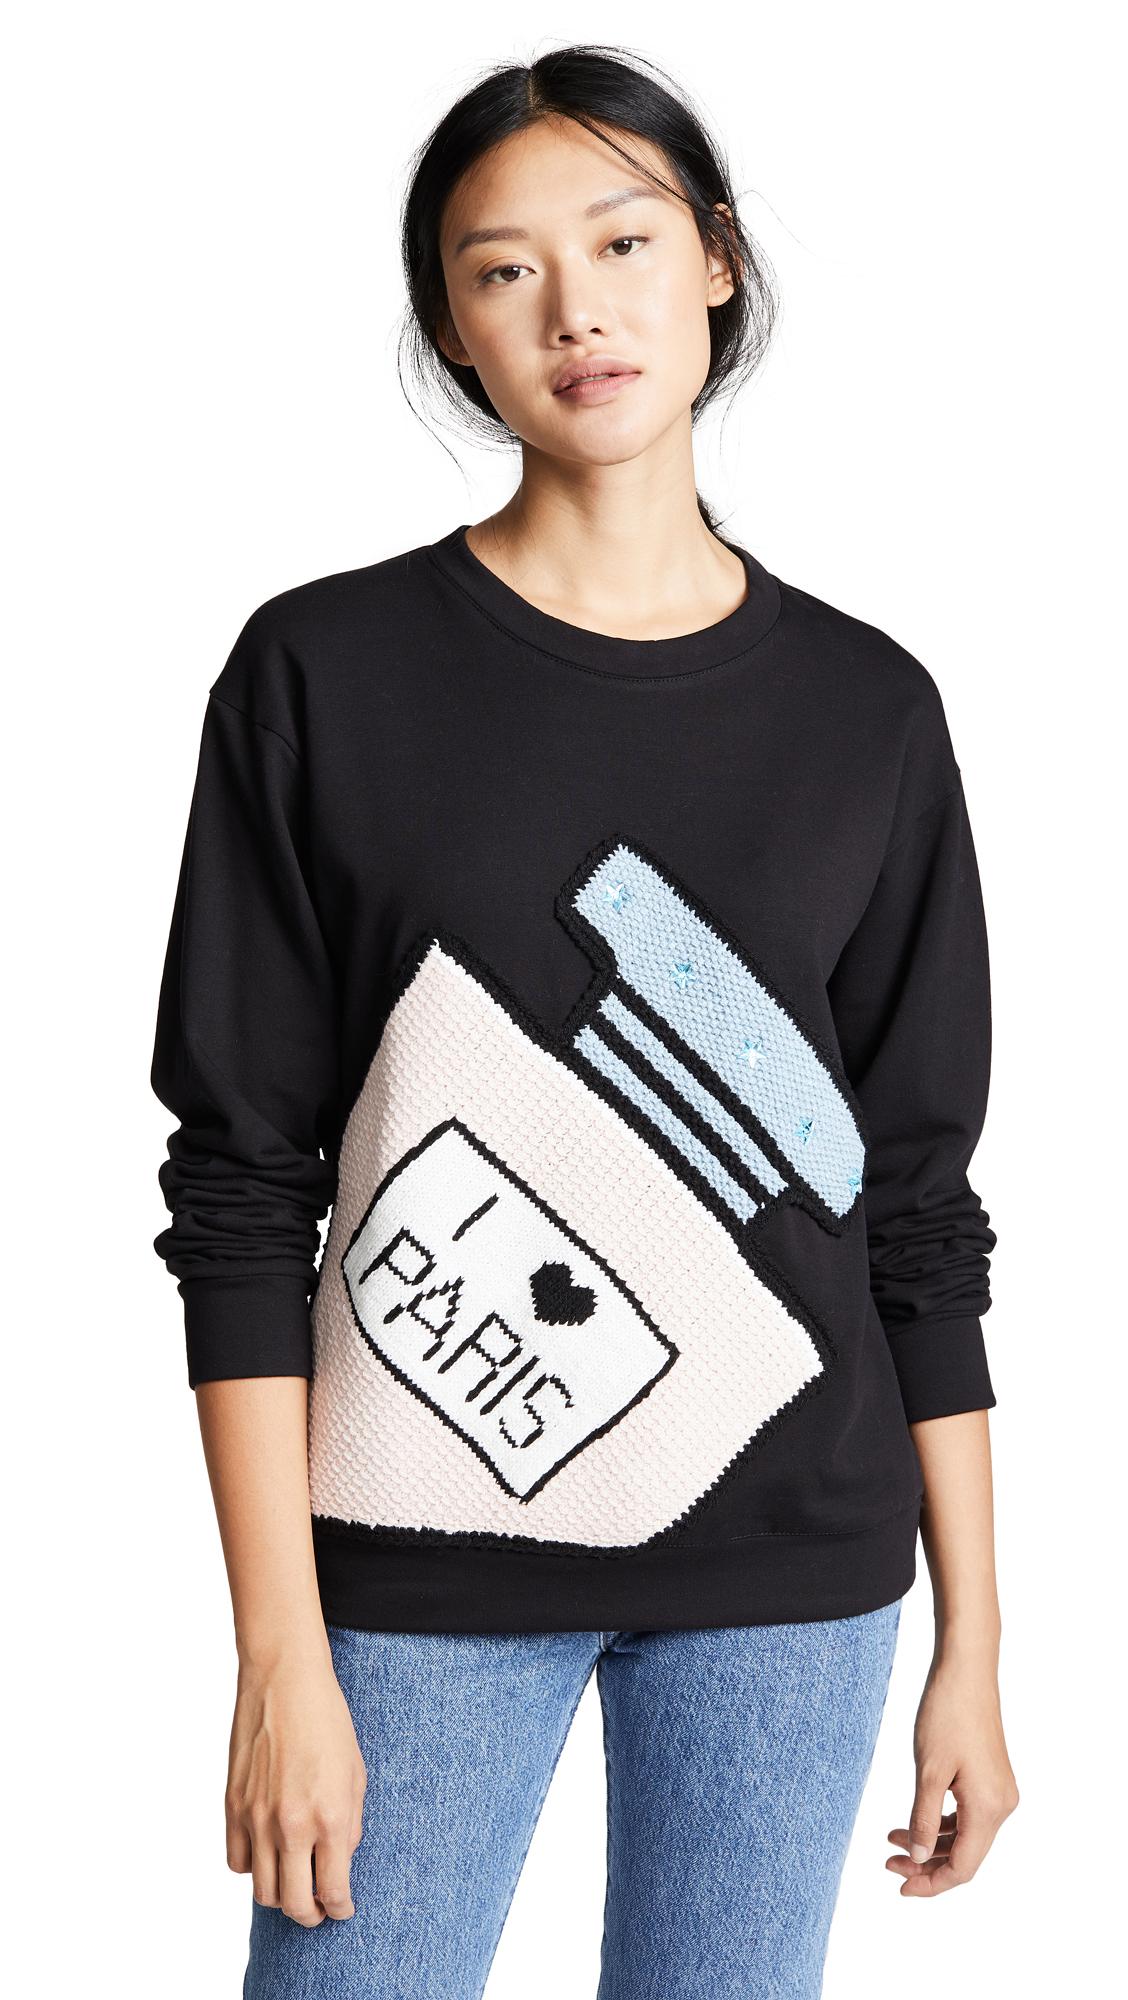 Michaela Buerger I Love Paris Perfume Bottle Sweatshirt In Black